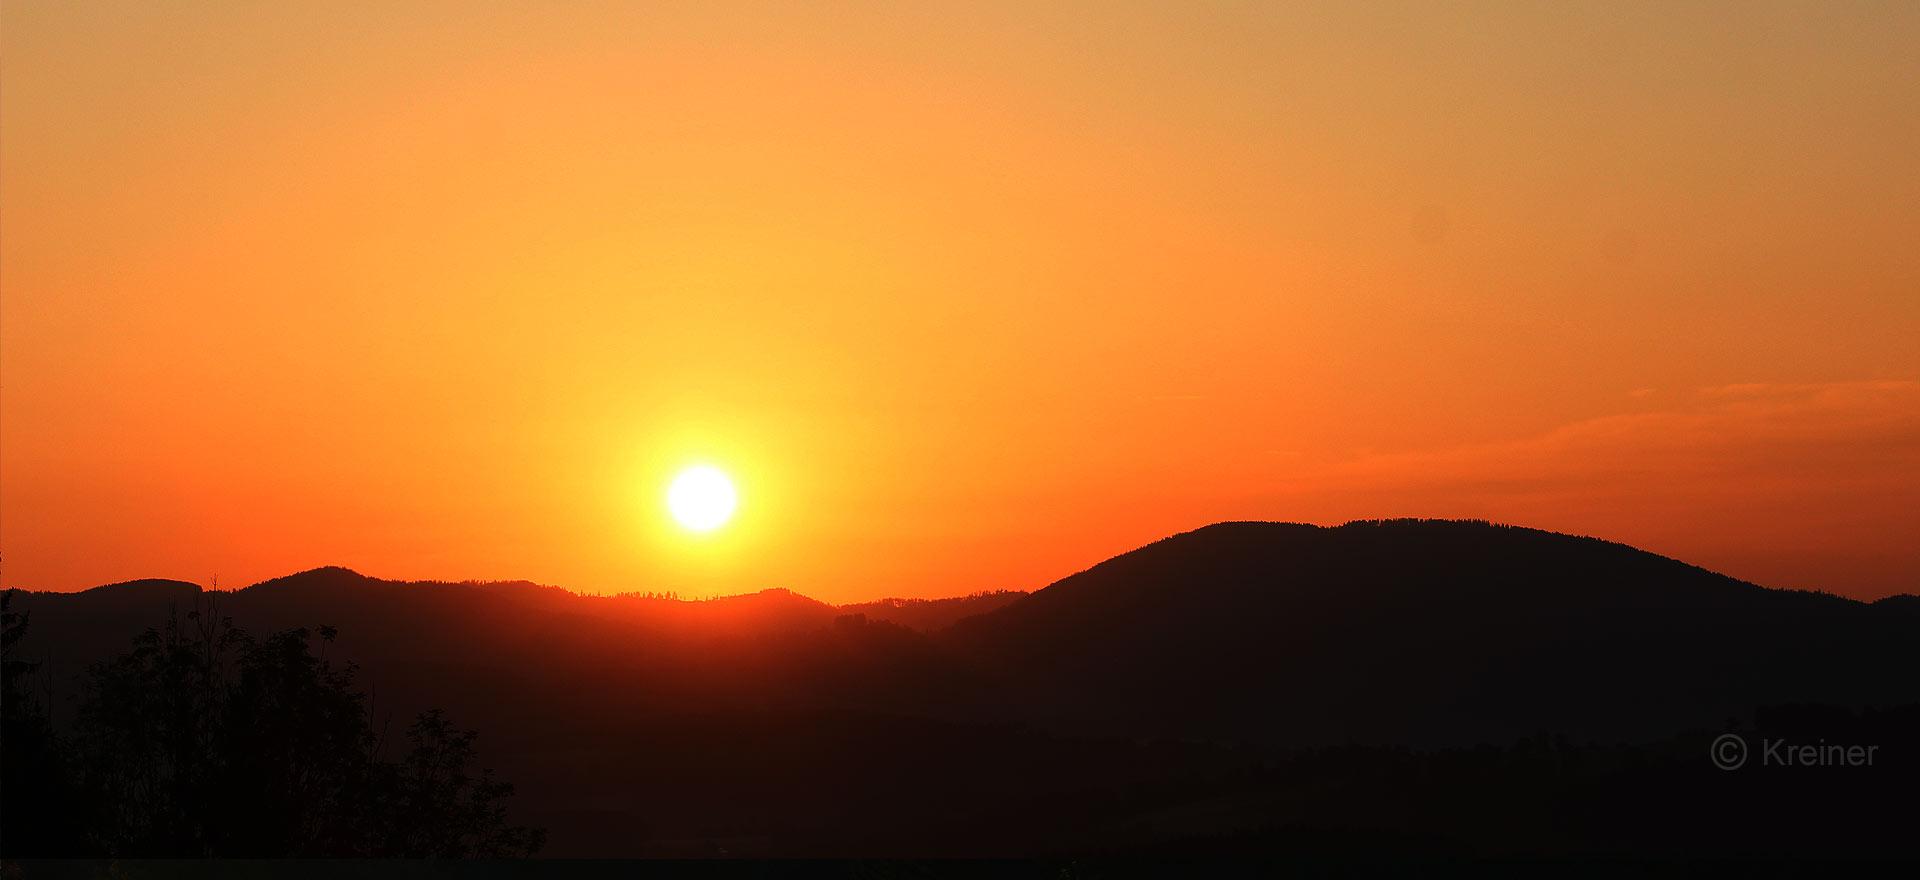 Sonnenaufgang im Naturpark Almenland